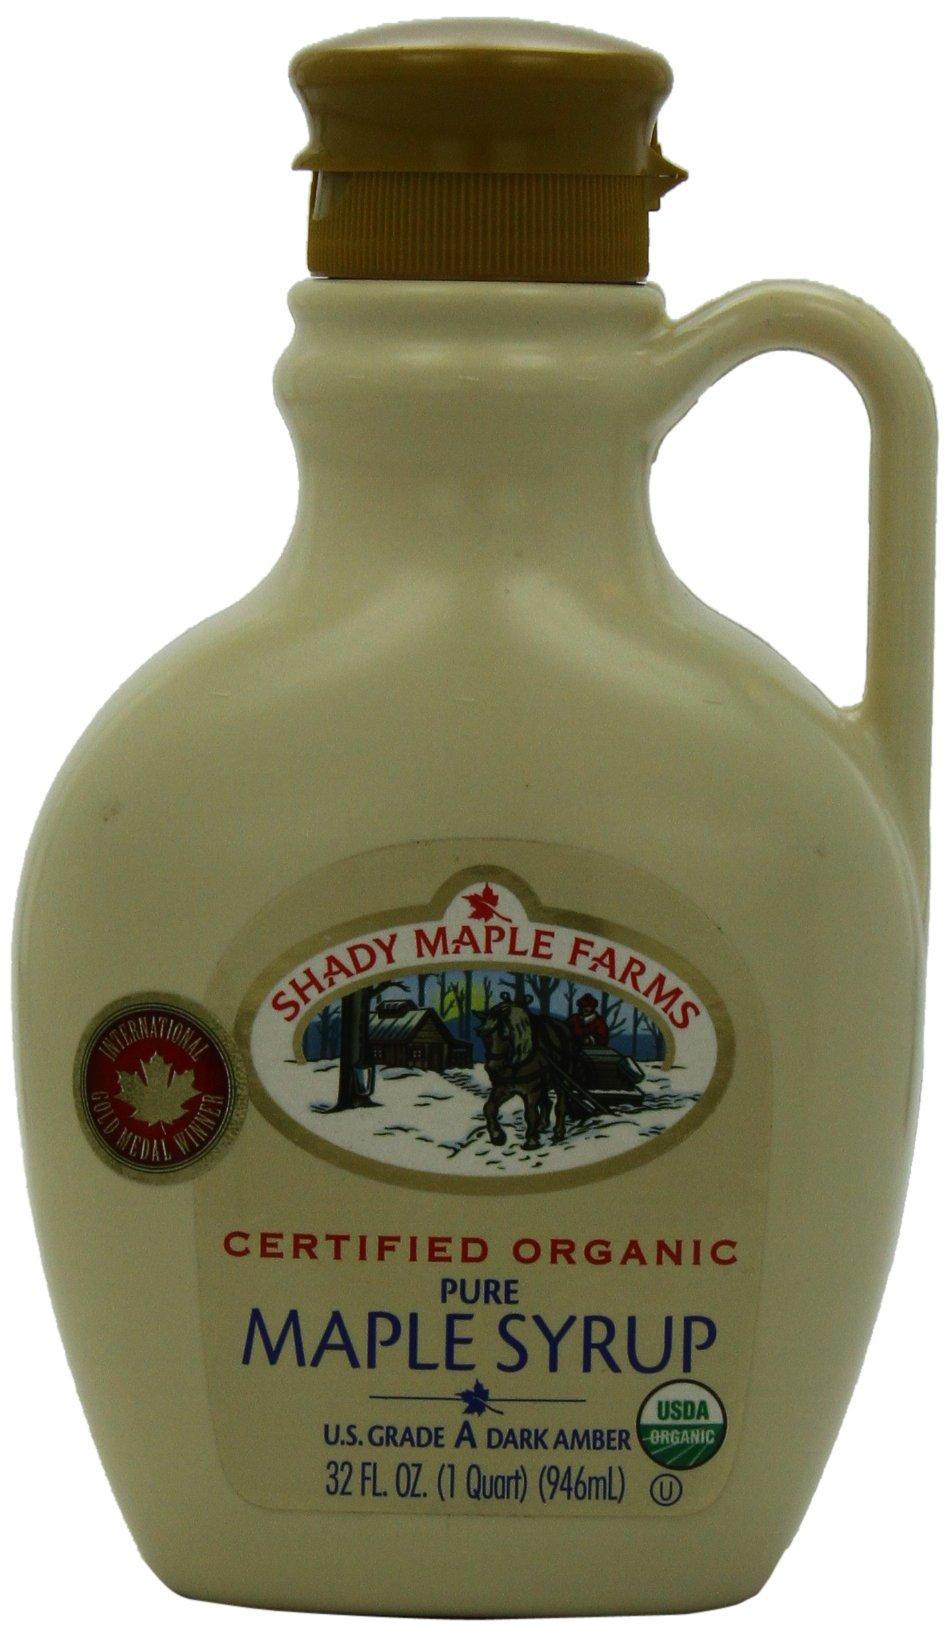 Shady Maple Farms Organic Maple Syrup Grade A, Dark Amber, 32 Ounce